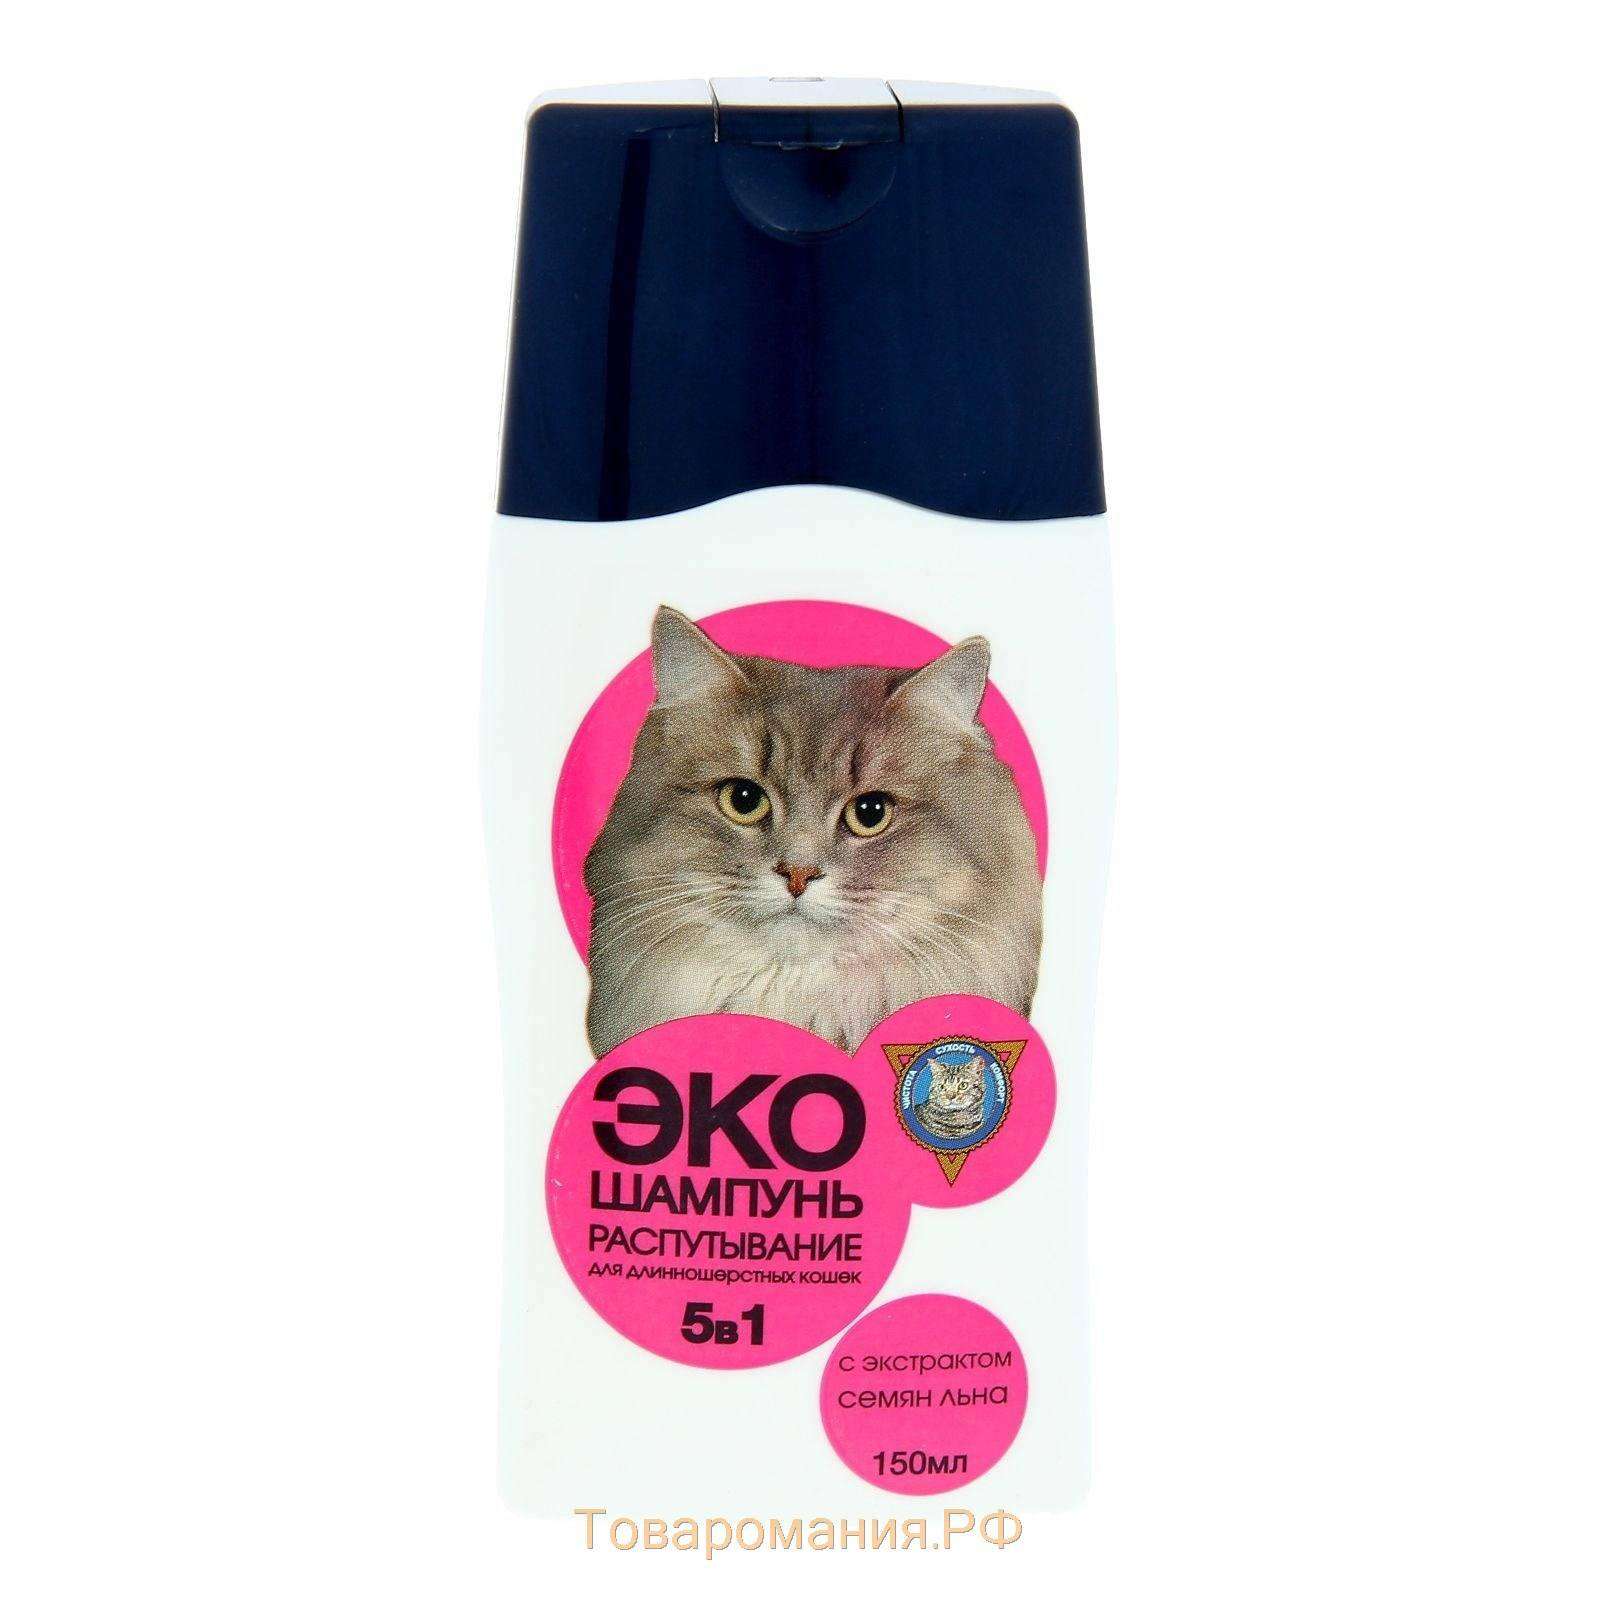 Преимущества сухого шампуня для кошек